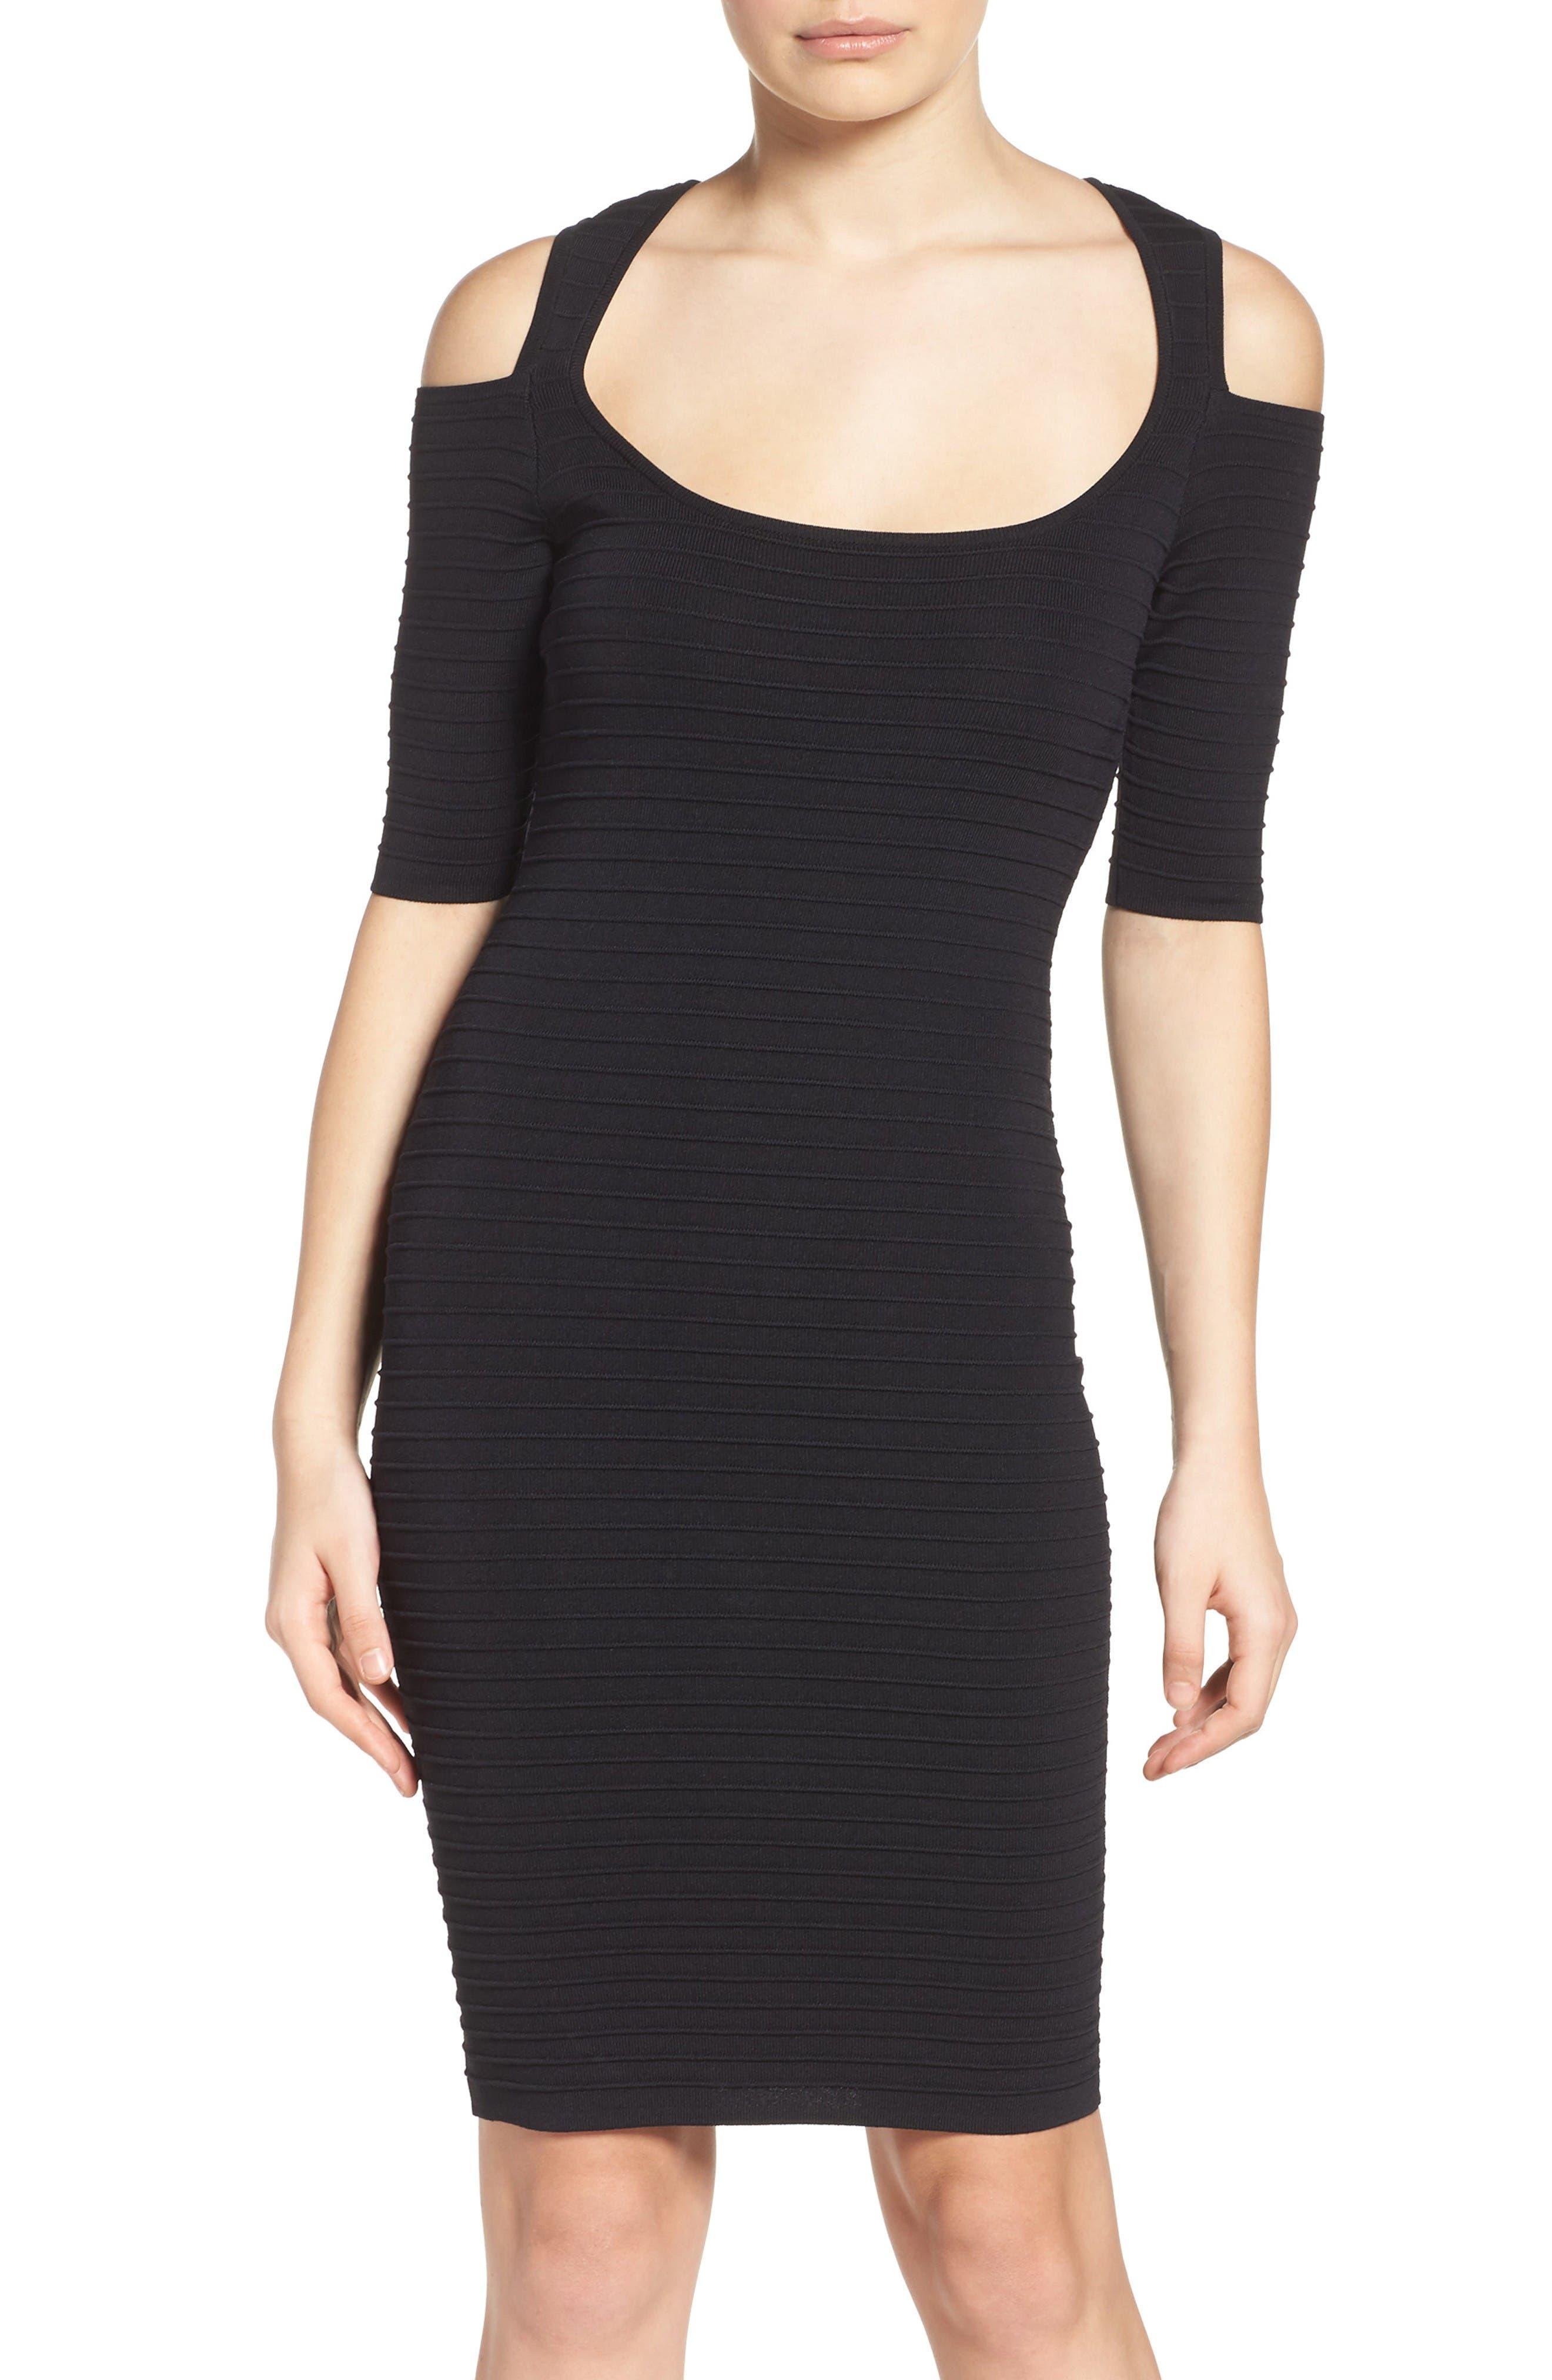 Ali & Jay Cold Shoulder Body-Con Dress